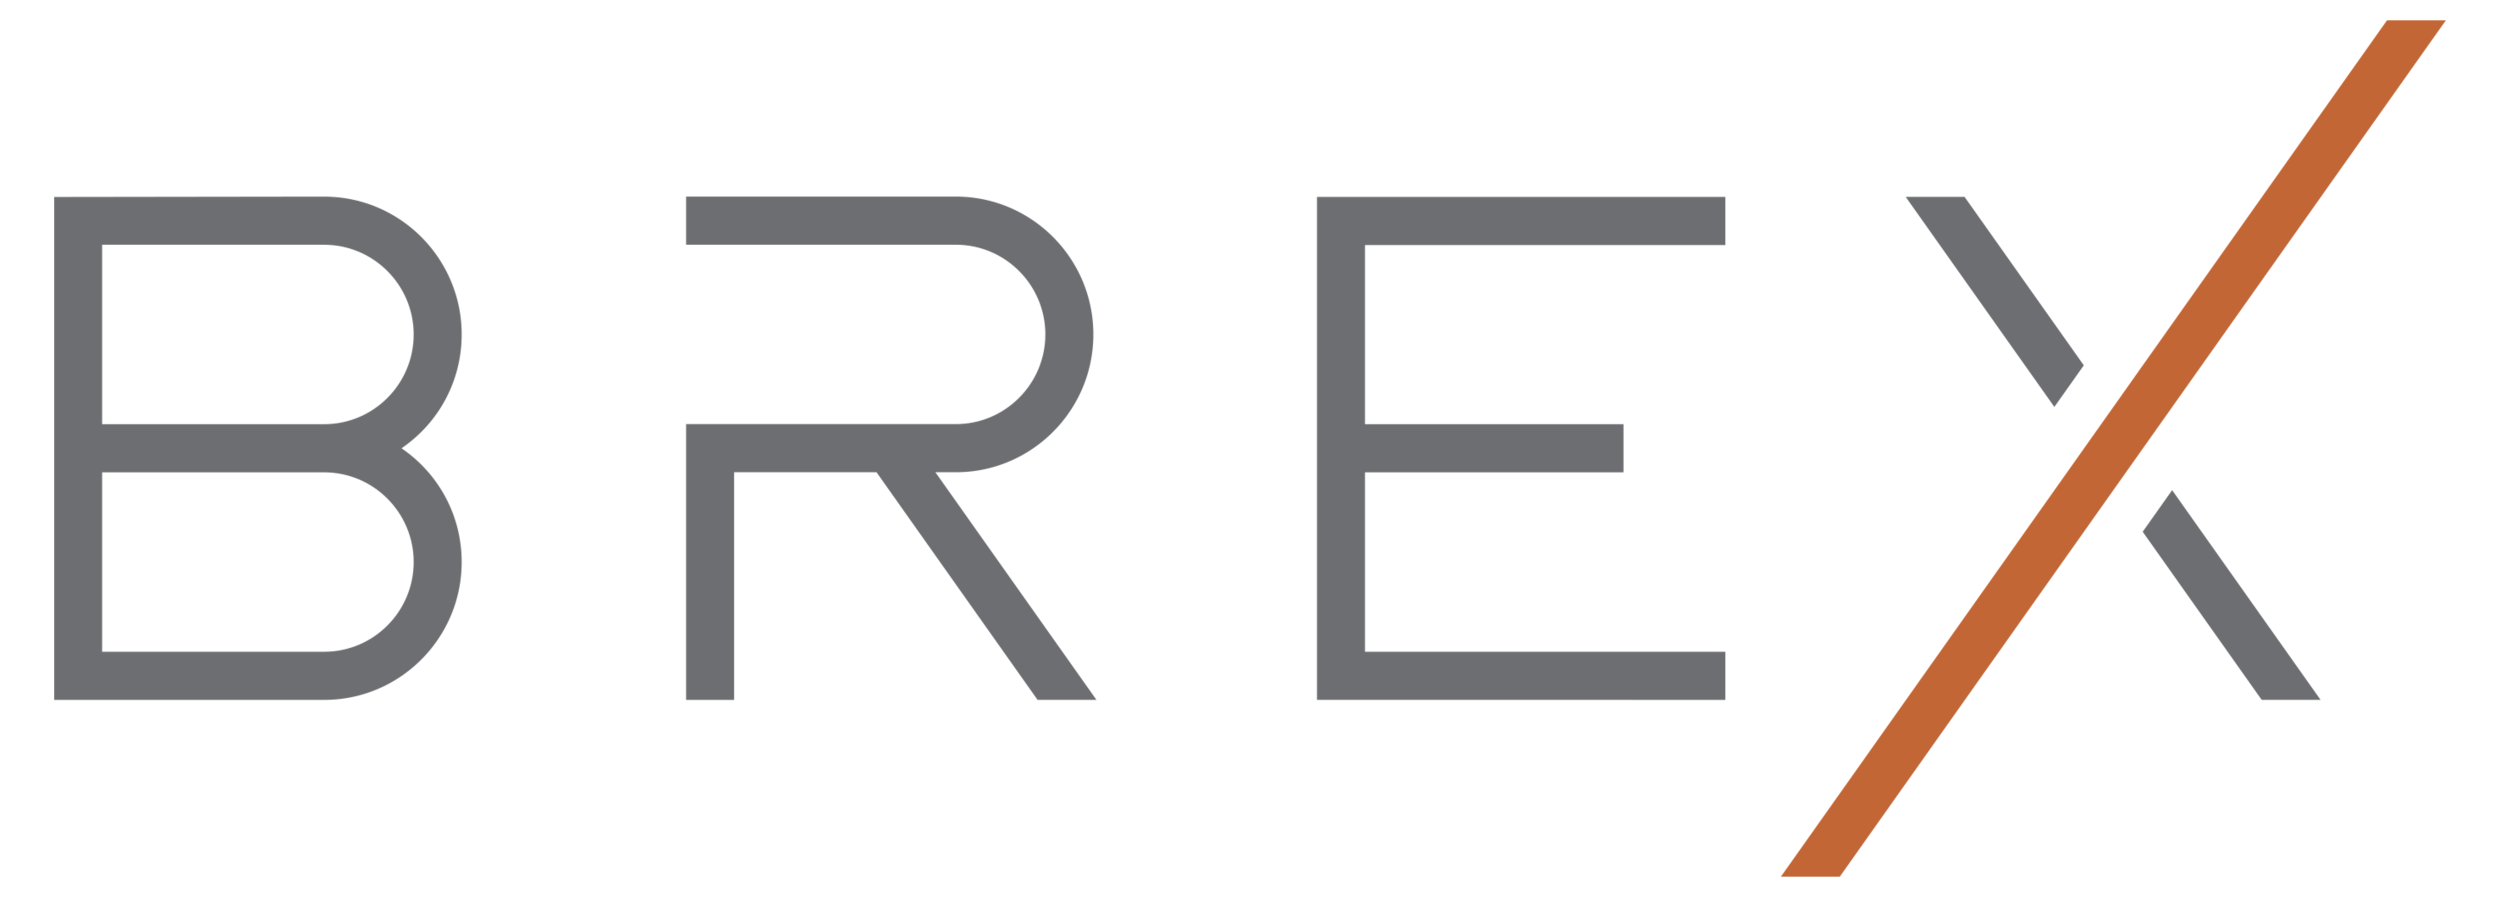 brex logo.png